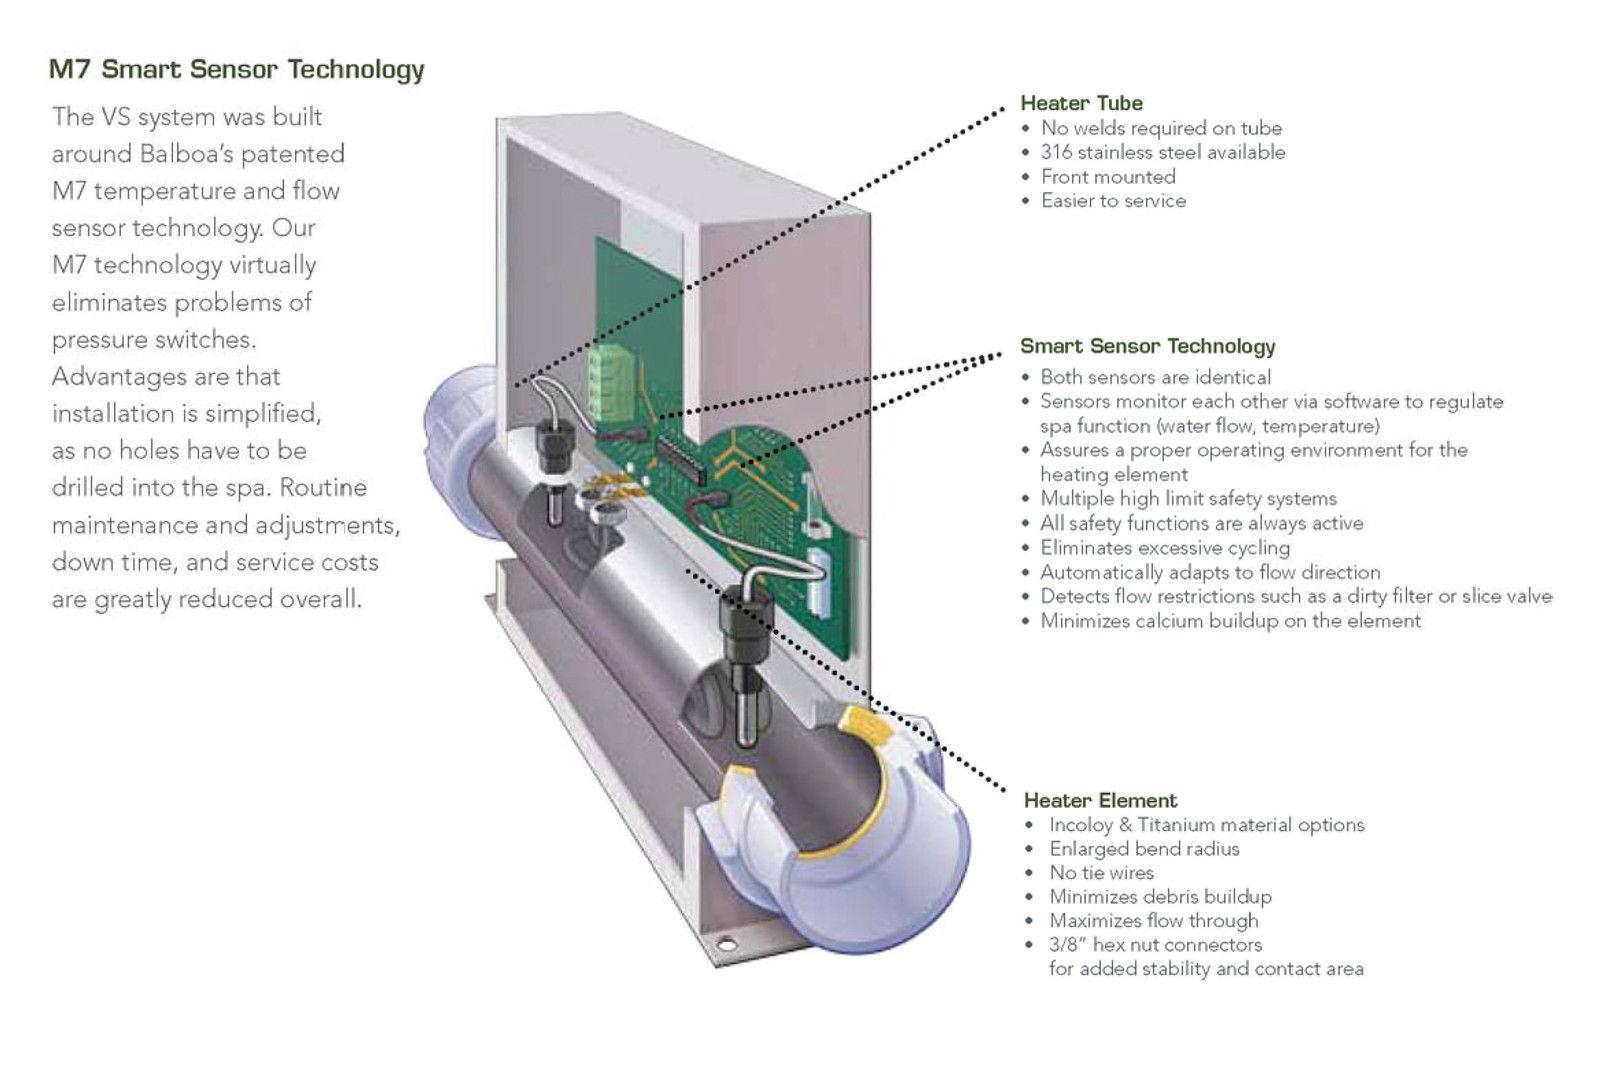 balboa spa pack wiring diagram 95 honda civic dx stereo bp501 hot tub heater 56485 01 ebay